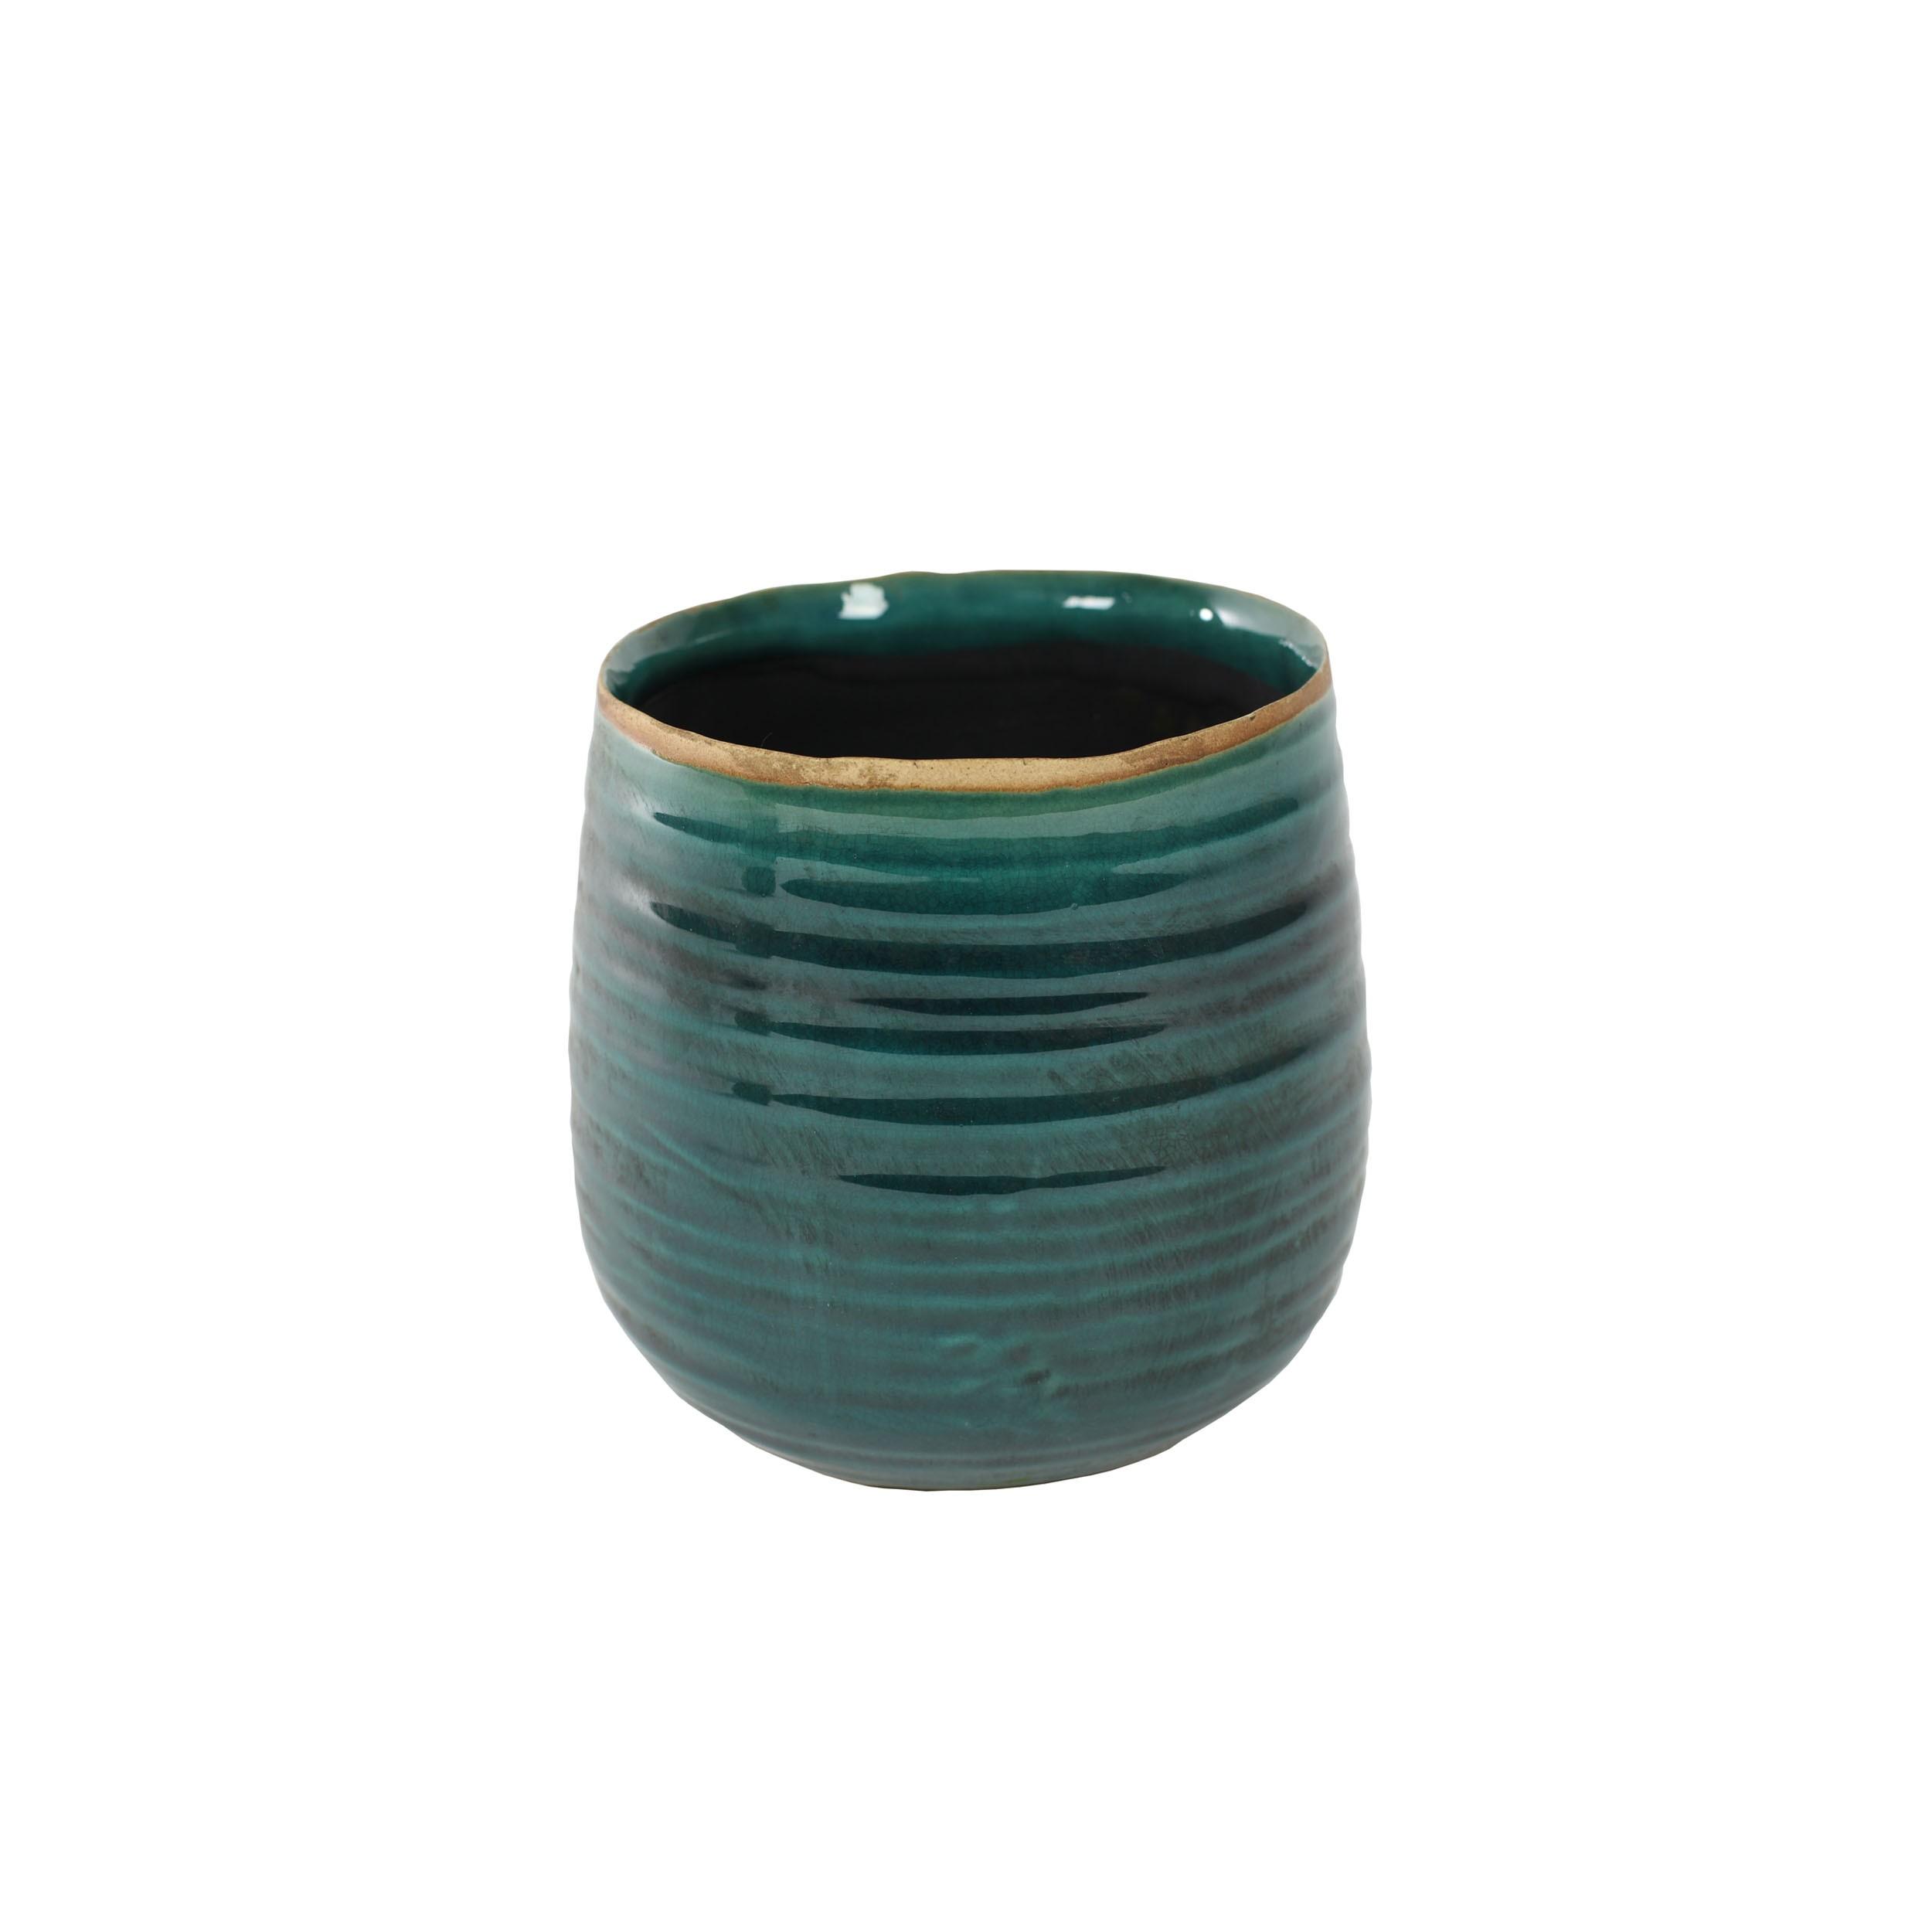 blumentopf keramik 14cm bertopf pflanztopf rund glasiert indoor ebay. Black Bedroom Furniture Sets. Home Design Ideas